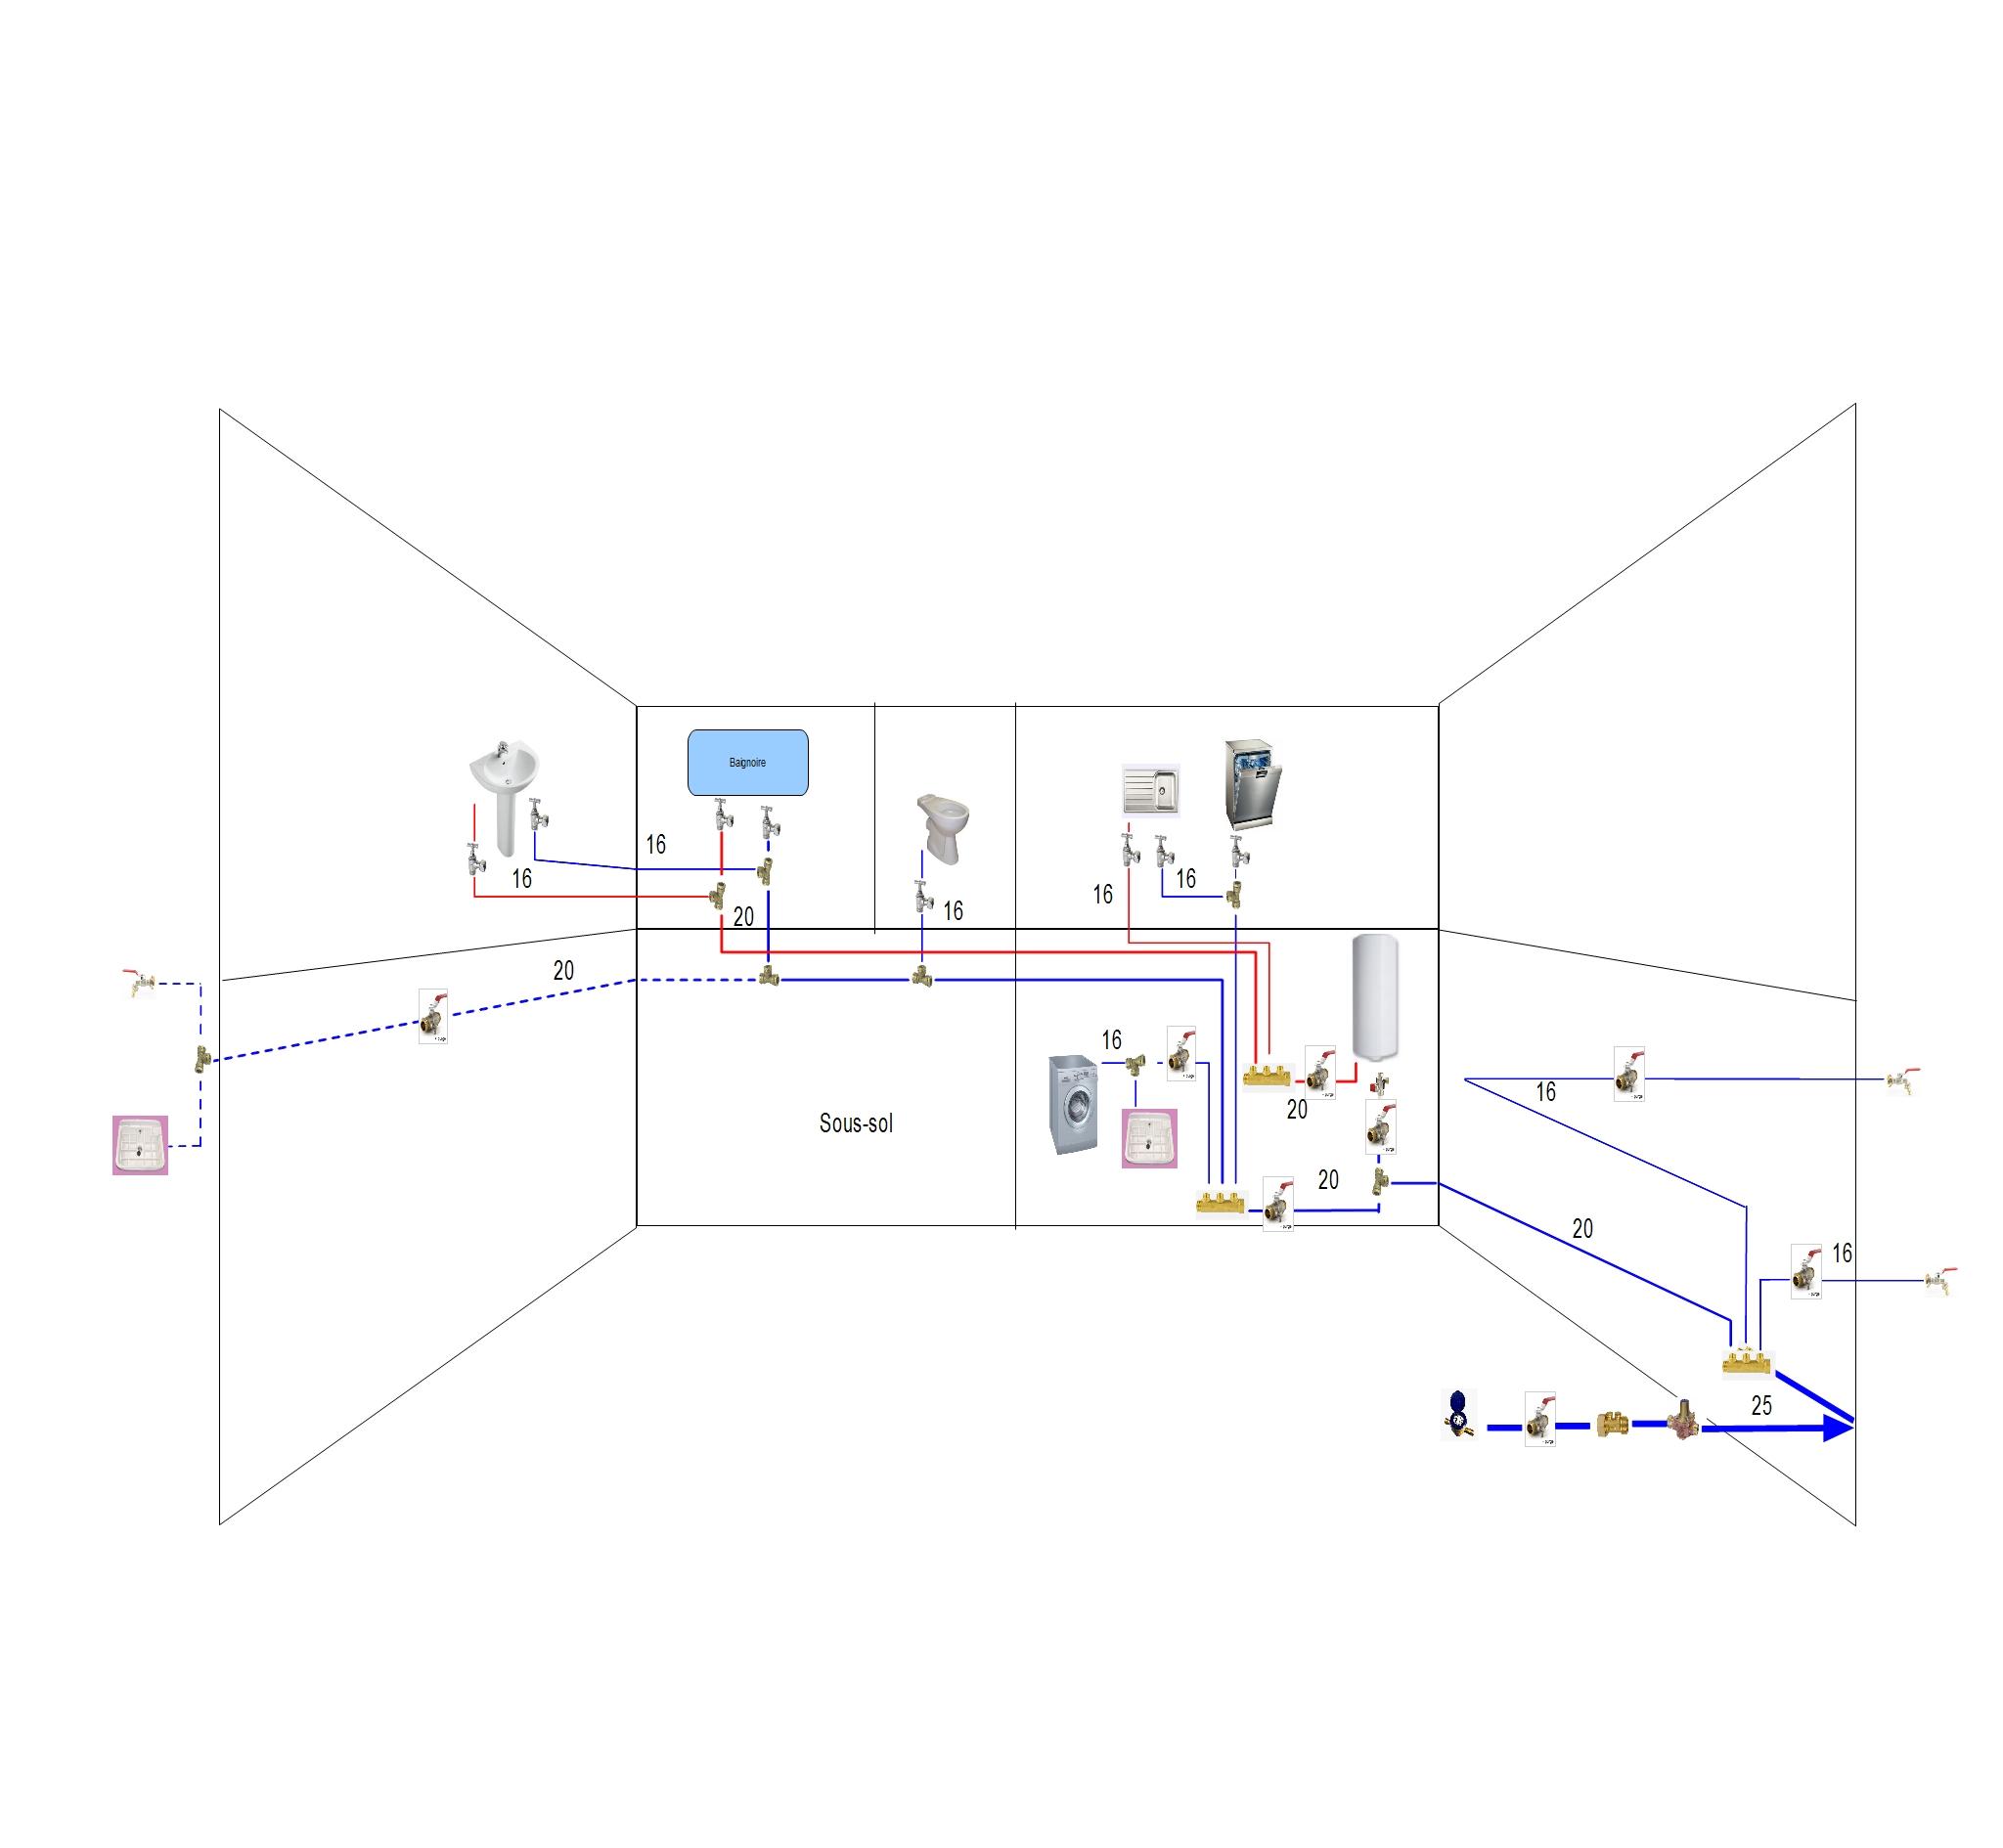 Plan eau multicouche à envoyer.jpg, 218.79 kb, 2048 x 1890